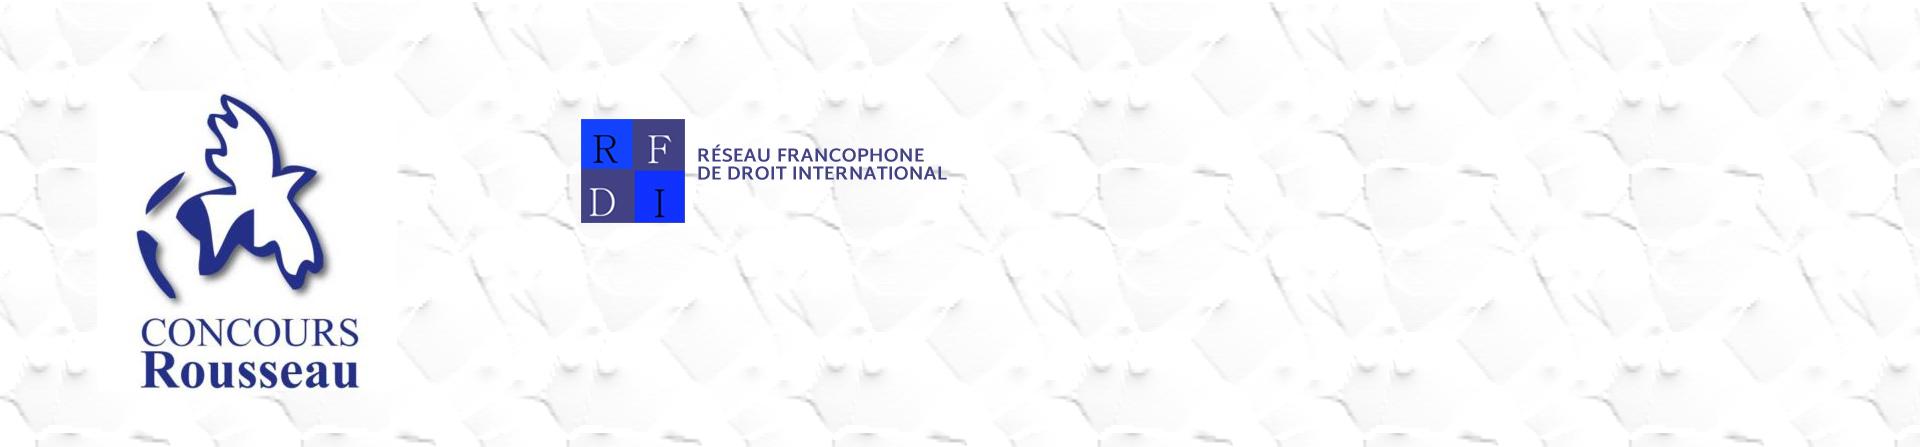 BA_UTC_Prix D Rousseau_2018.jpg